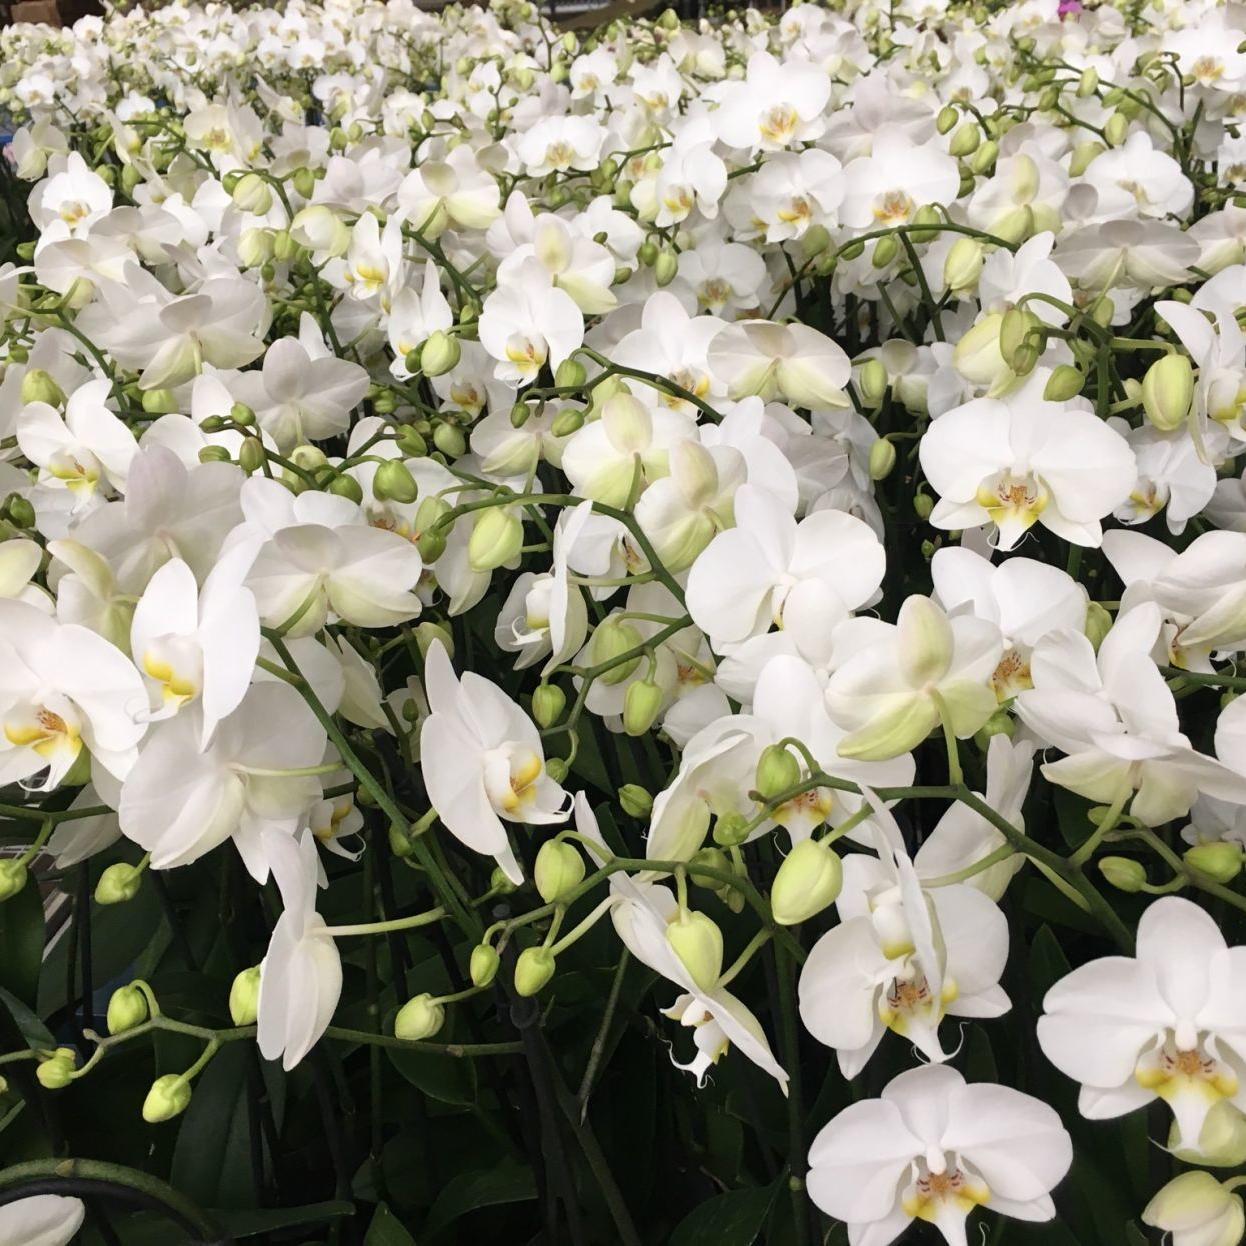 Orchids The No 1 Reason Phalaenopsis Don T Bloom Richmond Com